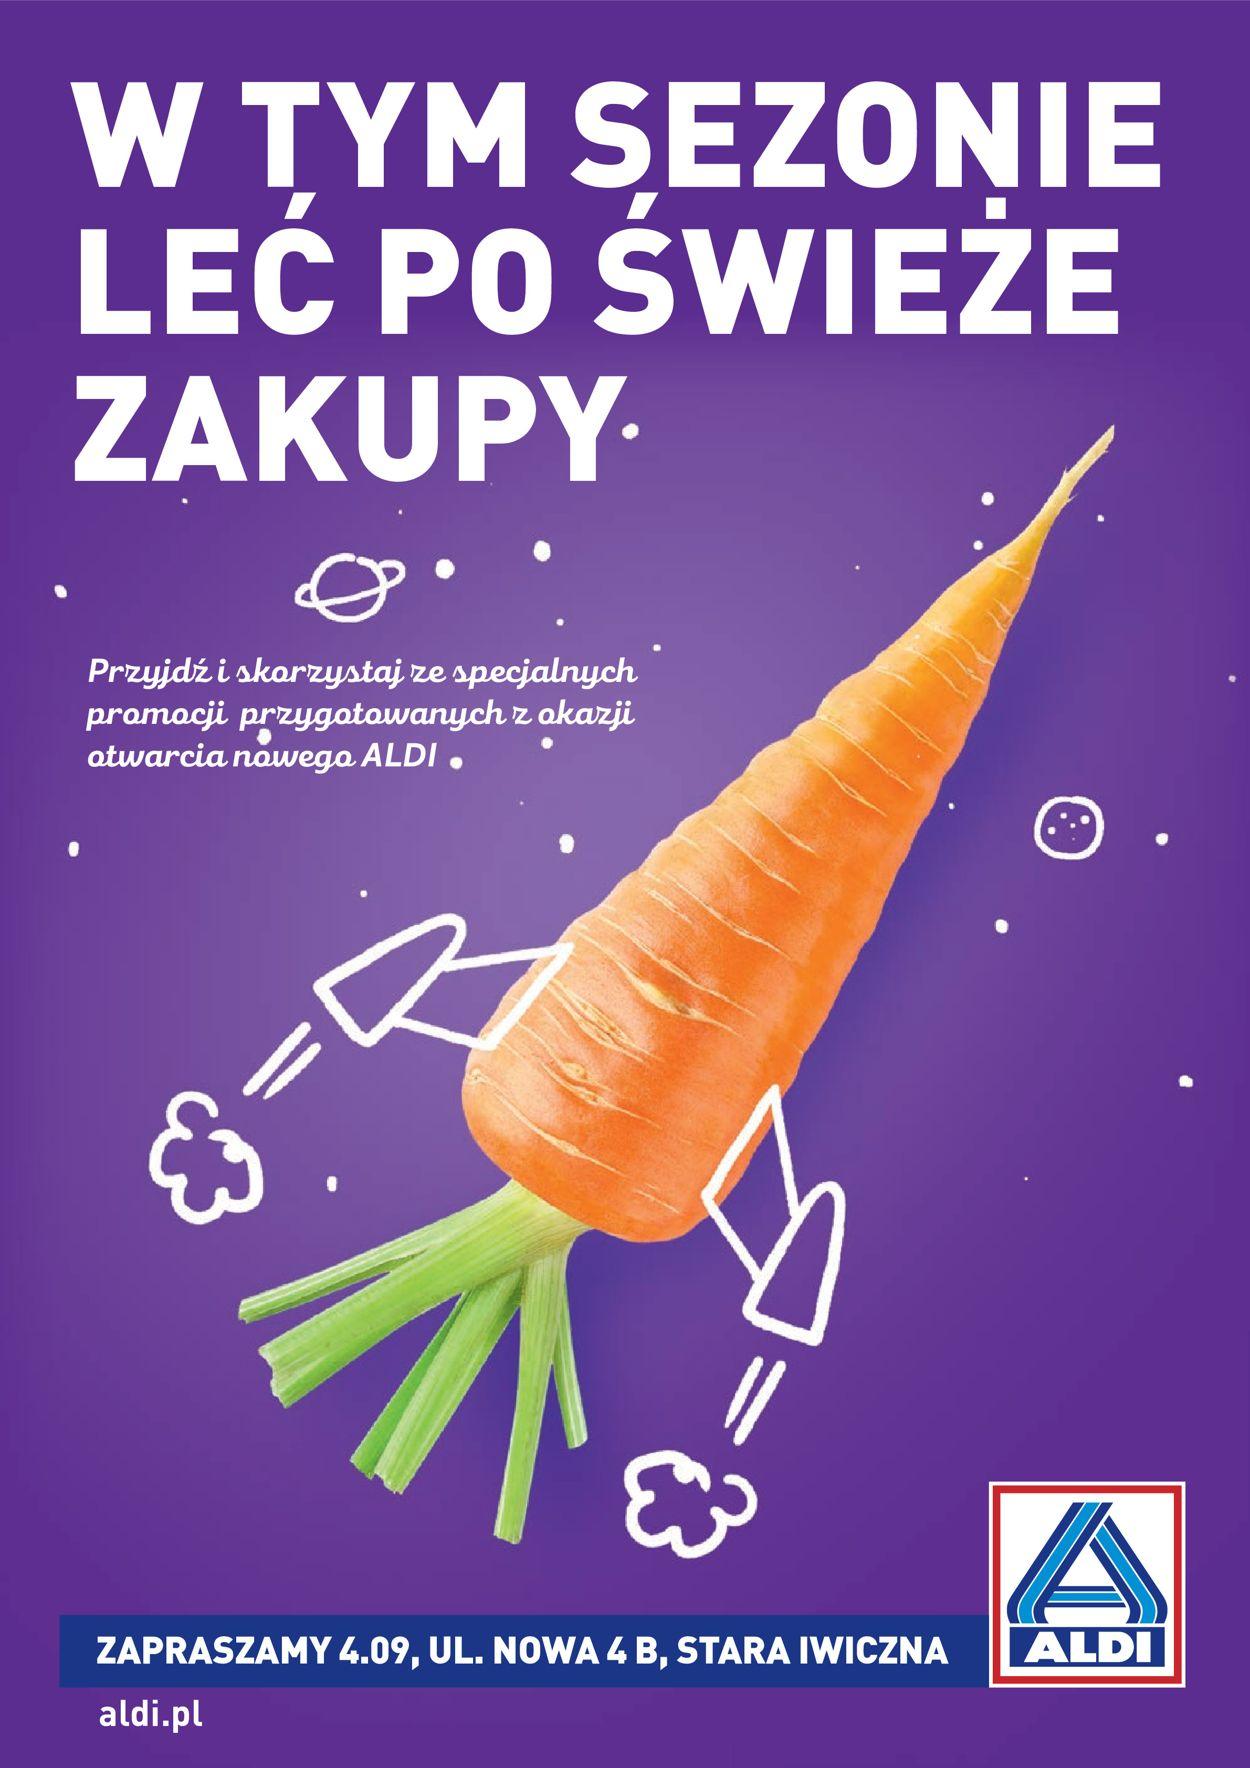 Gazetka promocyjna ALDI - 04.09-14.09.2019